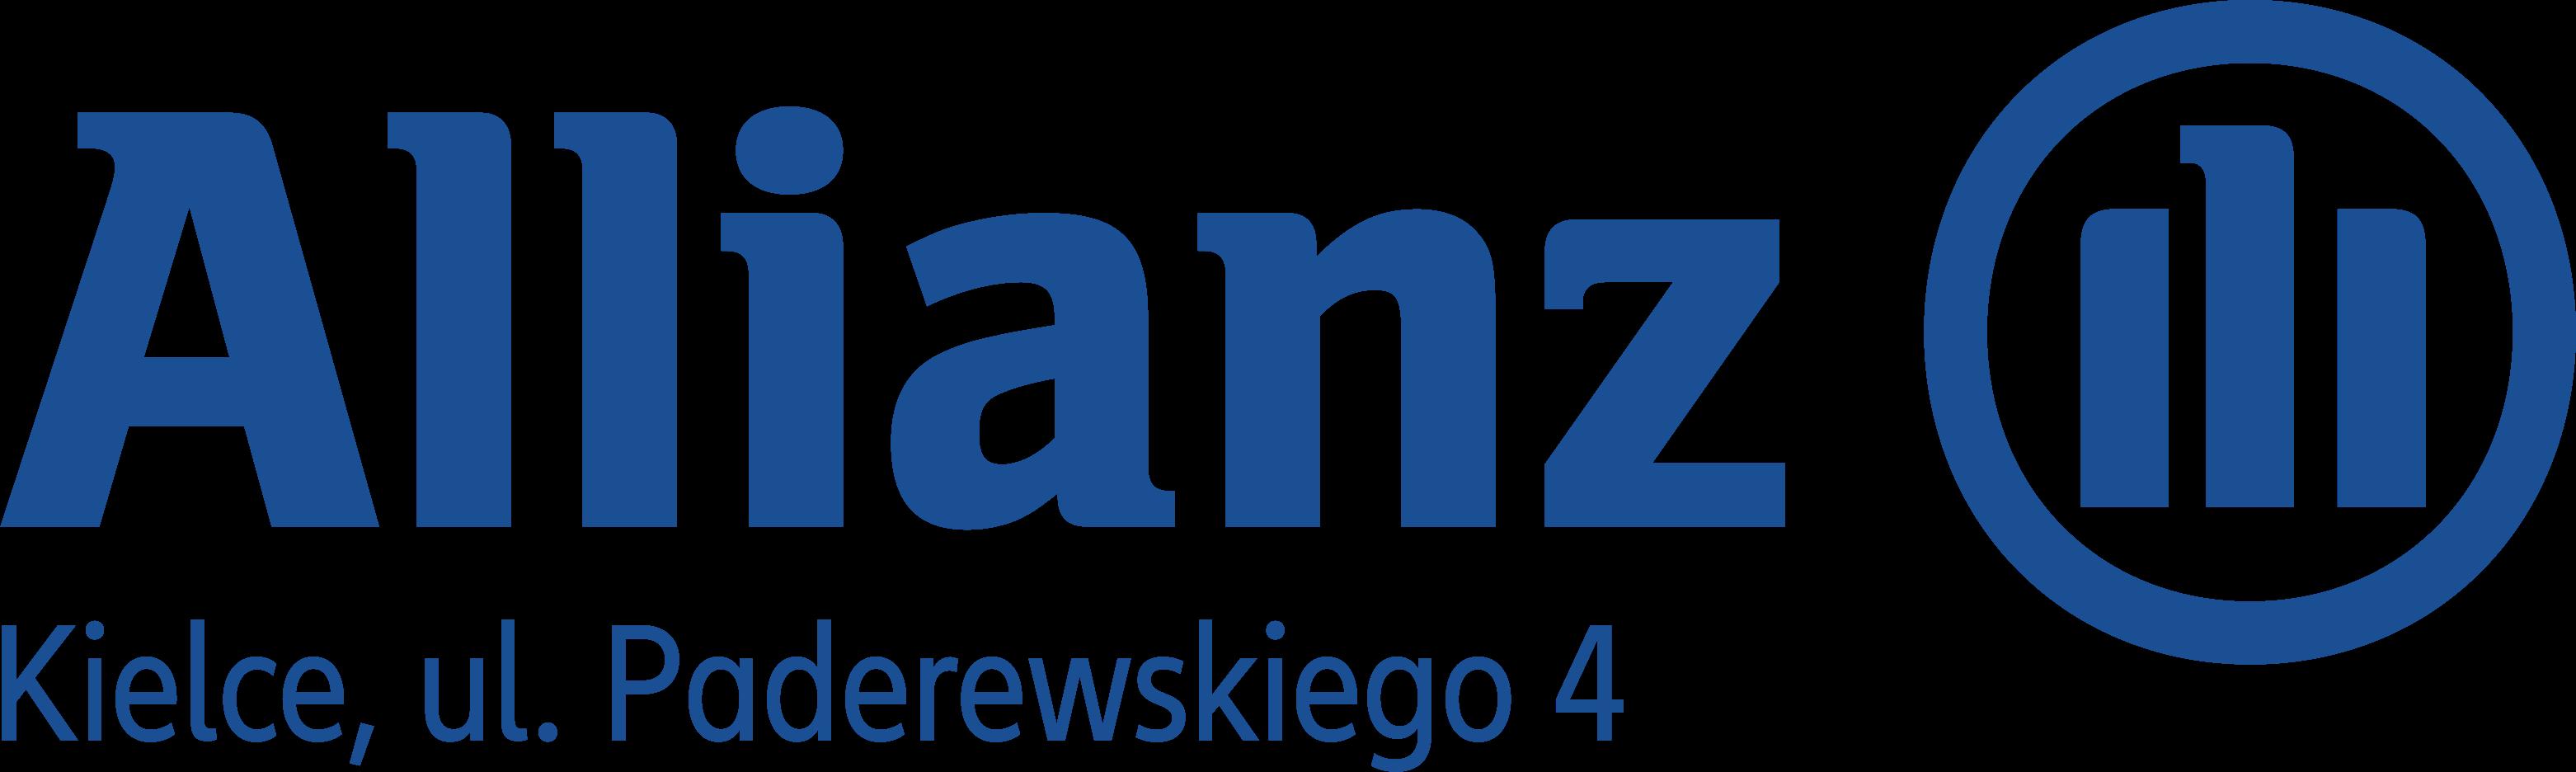 Allianz Kielce Robert Terlecki